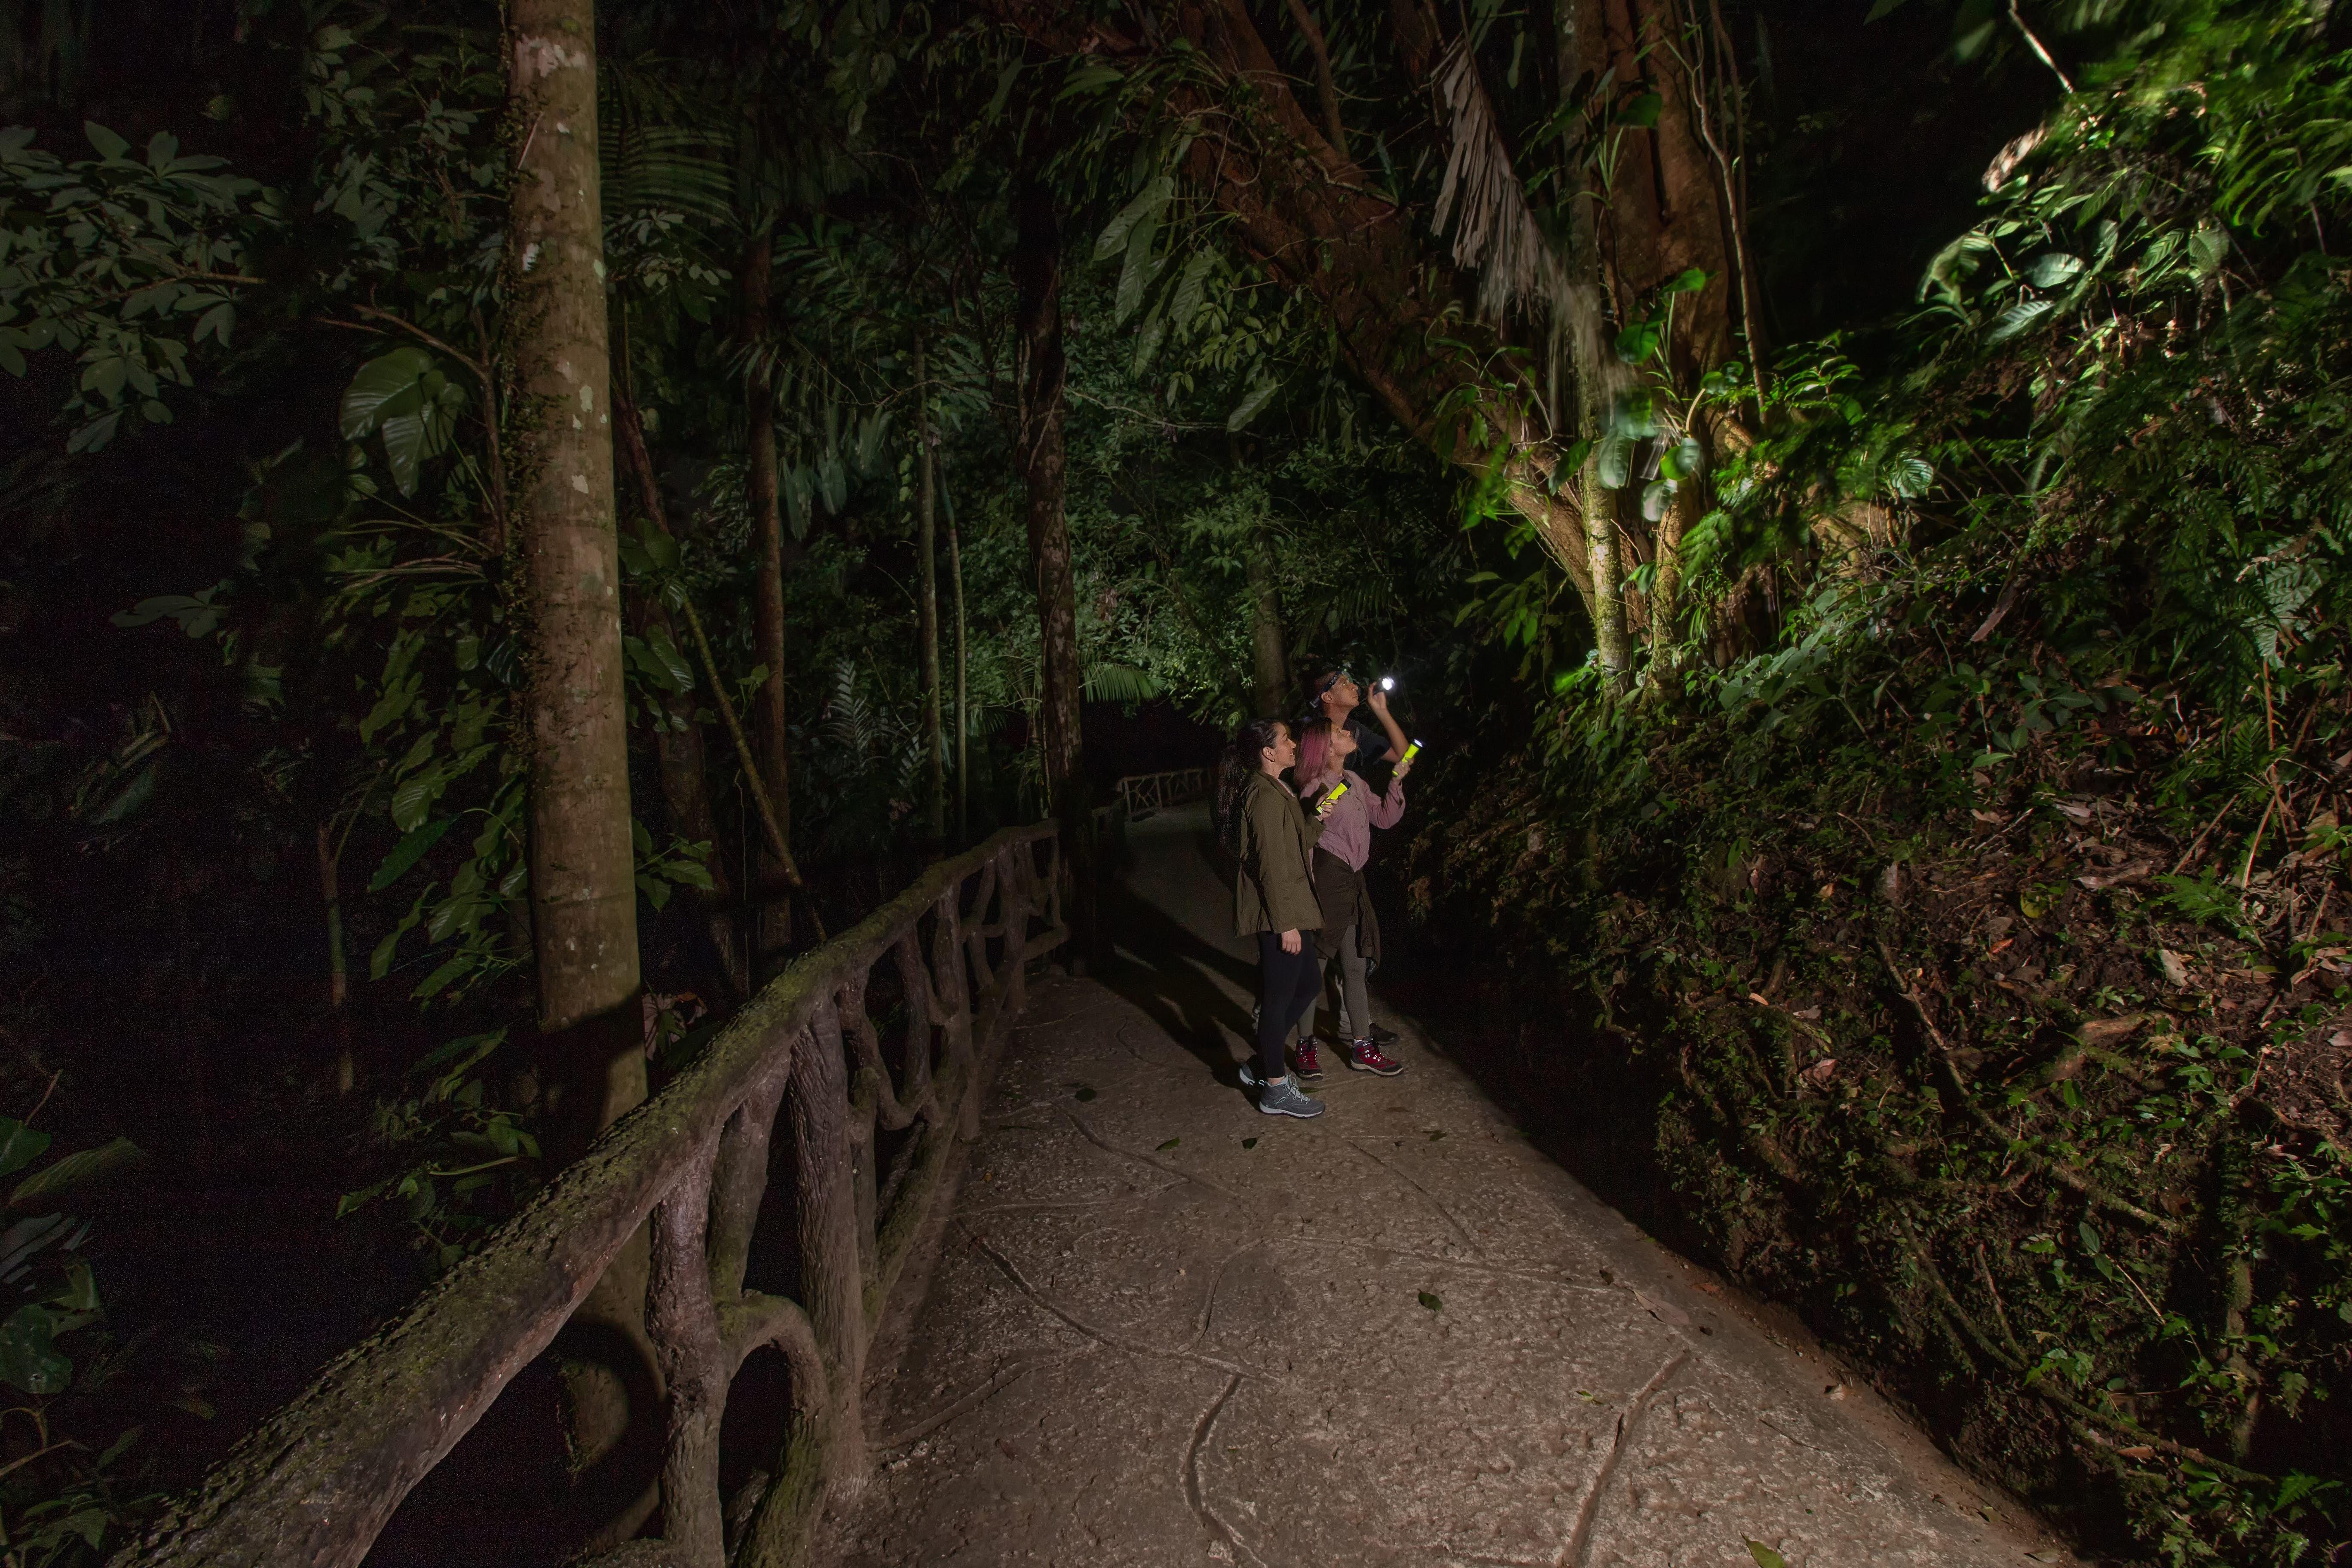 A night walk tour at Mistico Park